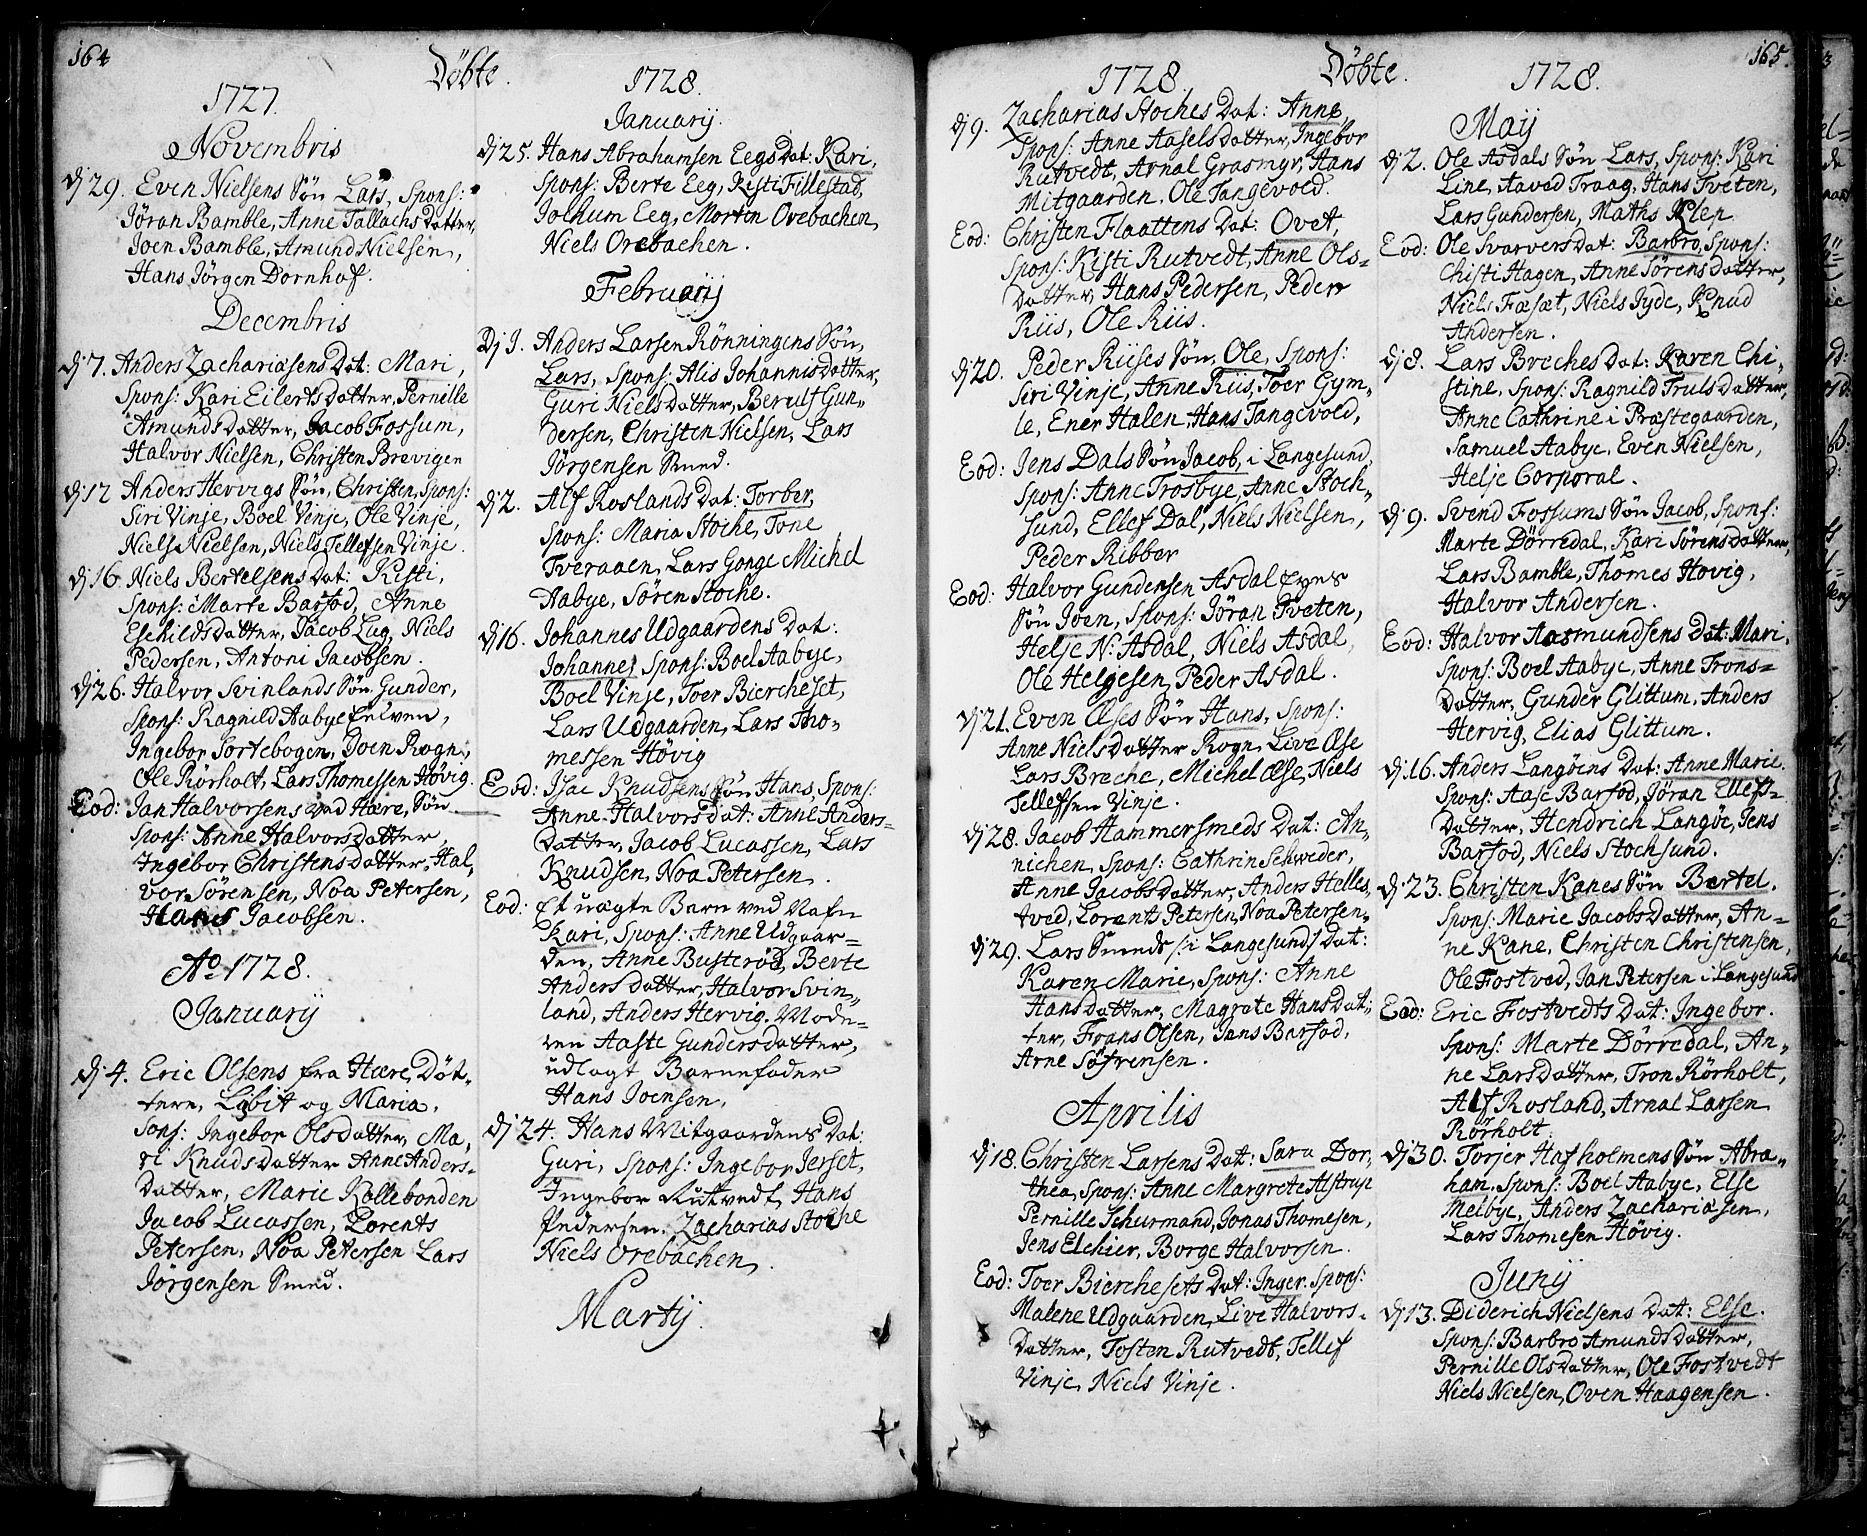 SAKO, Bamble kirkebøker, F/Fa/L0001: Ministerialbok nr. I 1, 1702-1774, s. 164-165